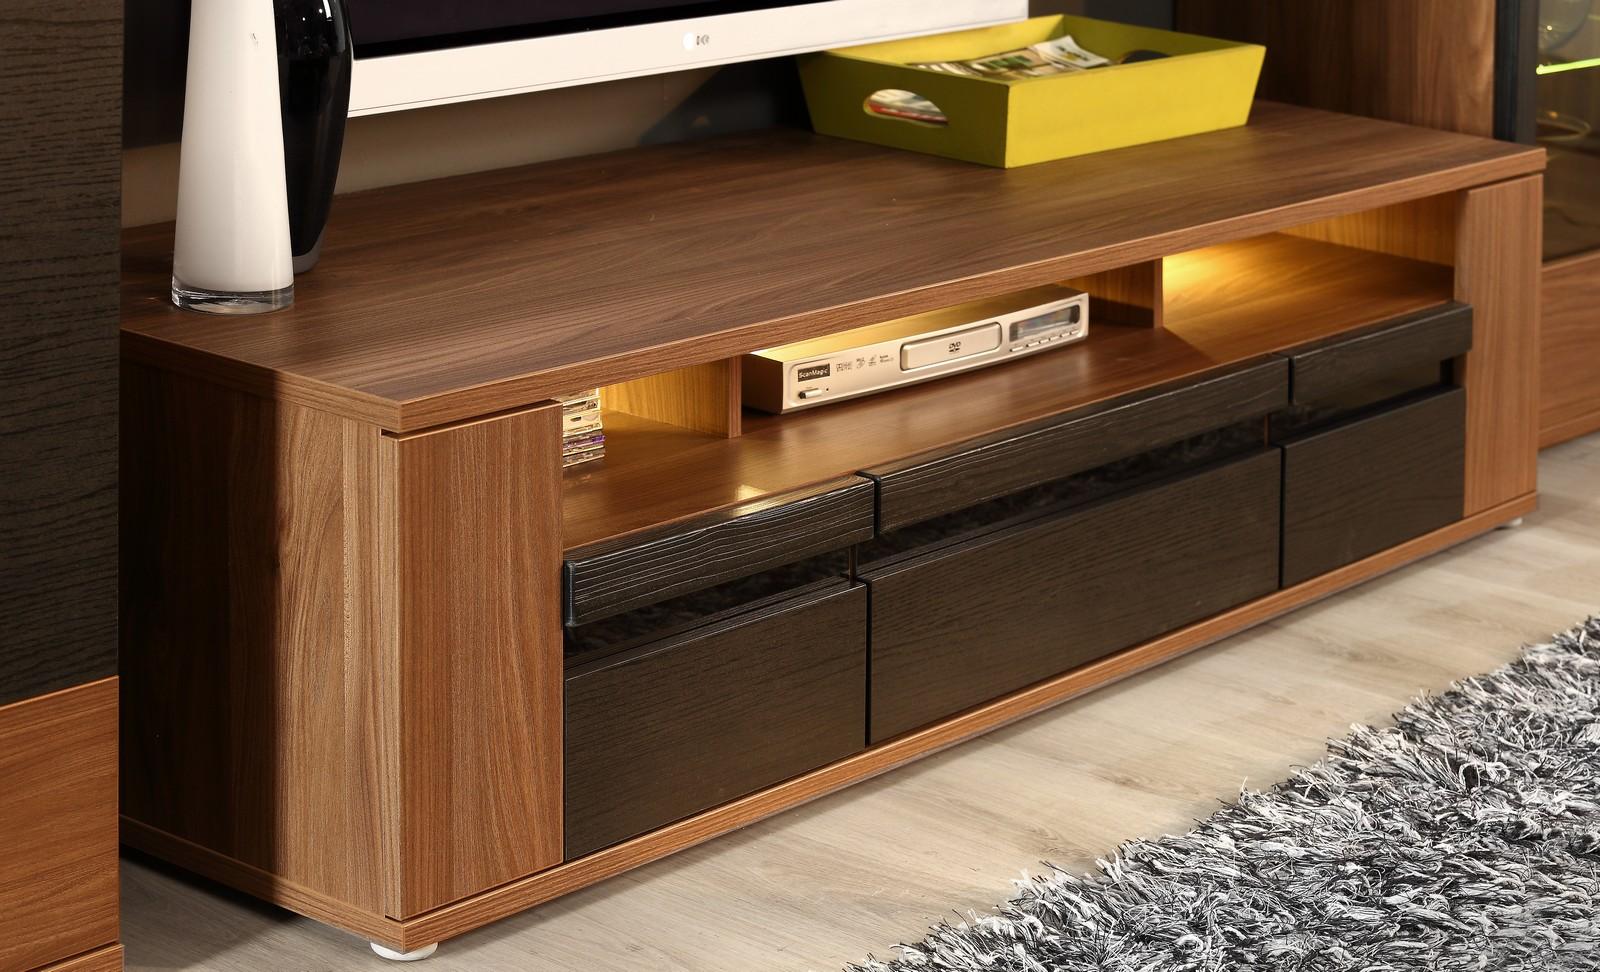 moebel24 pl wohnwand ulm mit led beleuchtung hochglanz ebay. Black Bedroom Furniture Sets. Home Design Ideas